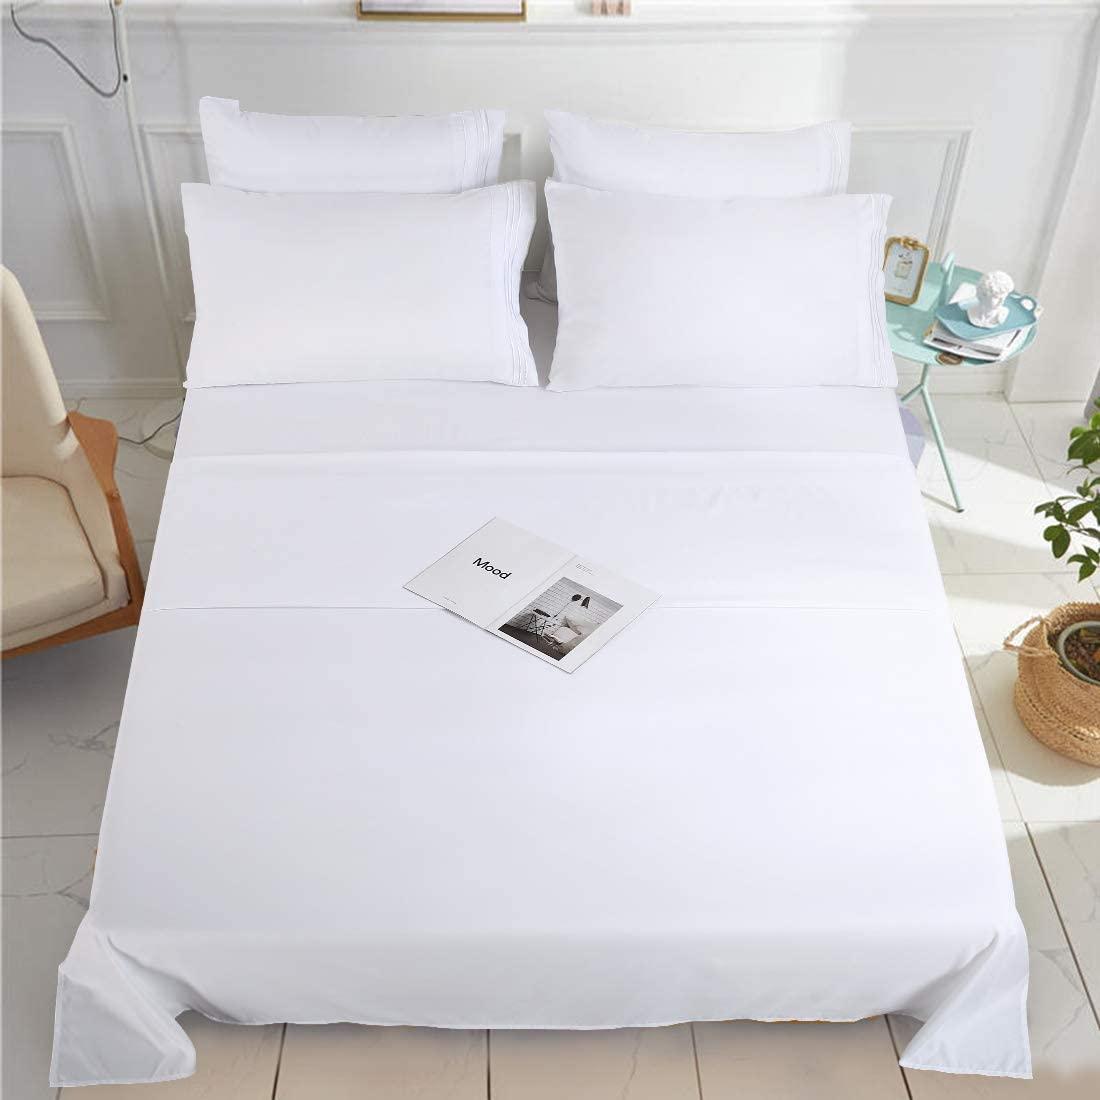 KARRISM Full Size 6 Piece Bed Sheets Set Extra Soft & Breathable Brushed 1800 Series Microfiber,Cooling, Wrinkle & Fade Resistant, Comfortable Deep Pocket Bedding Set, White